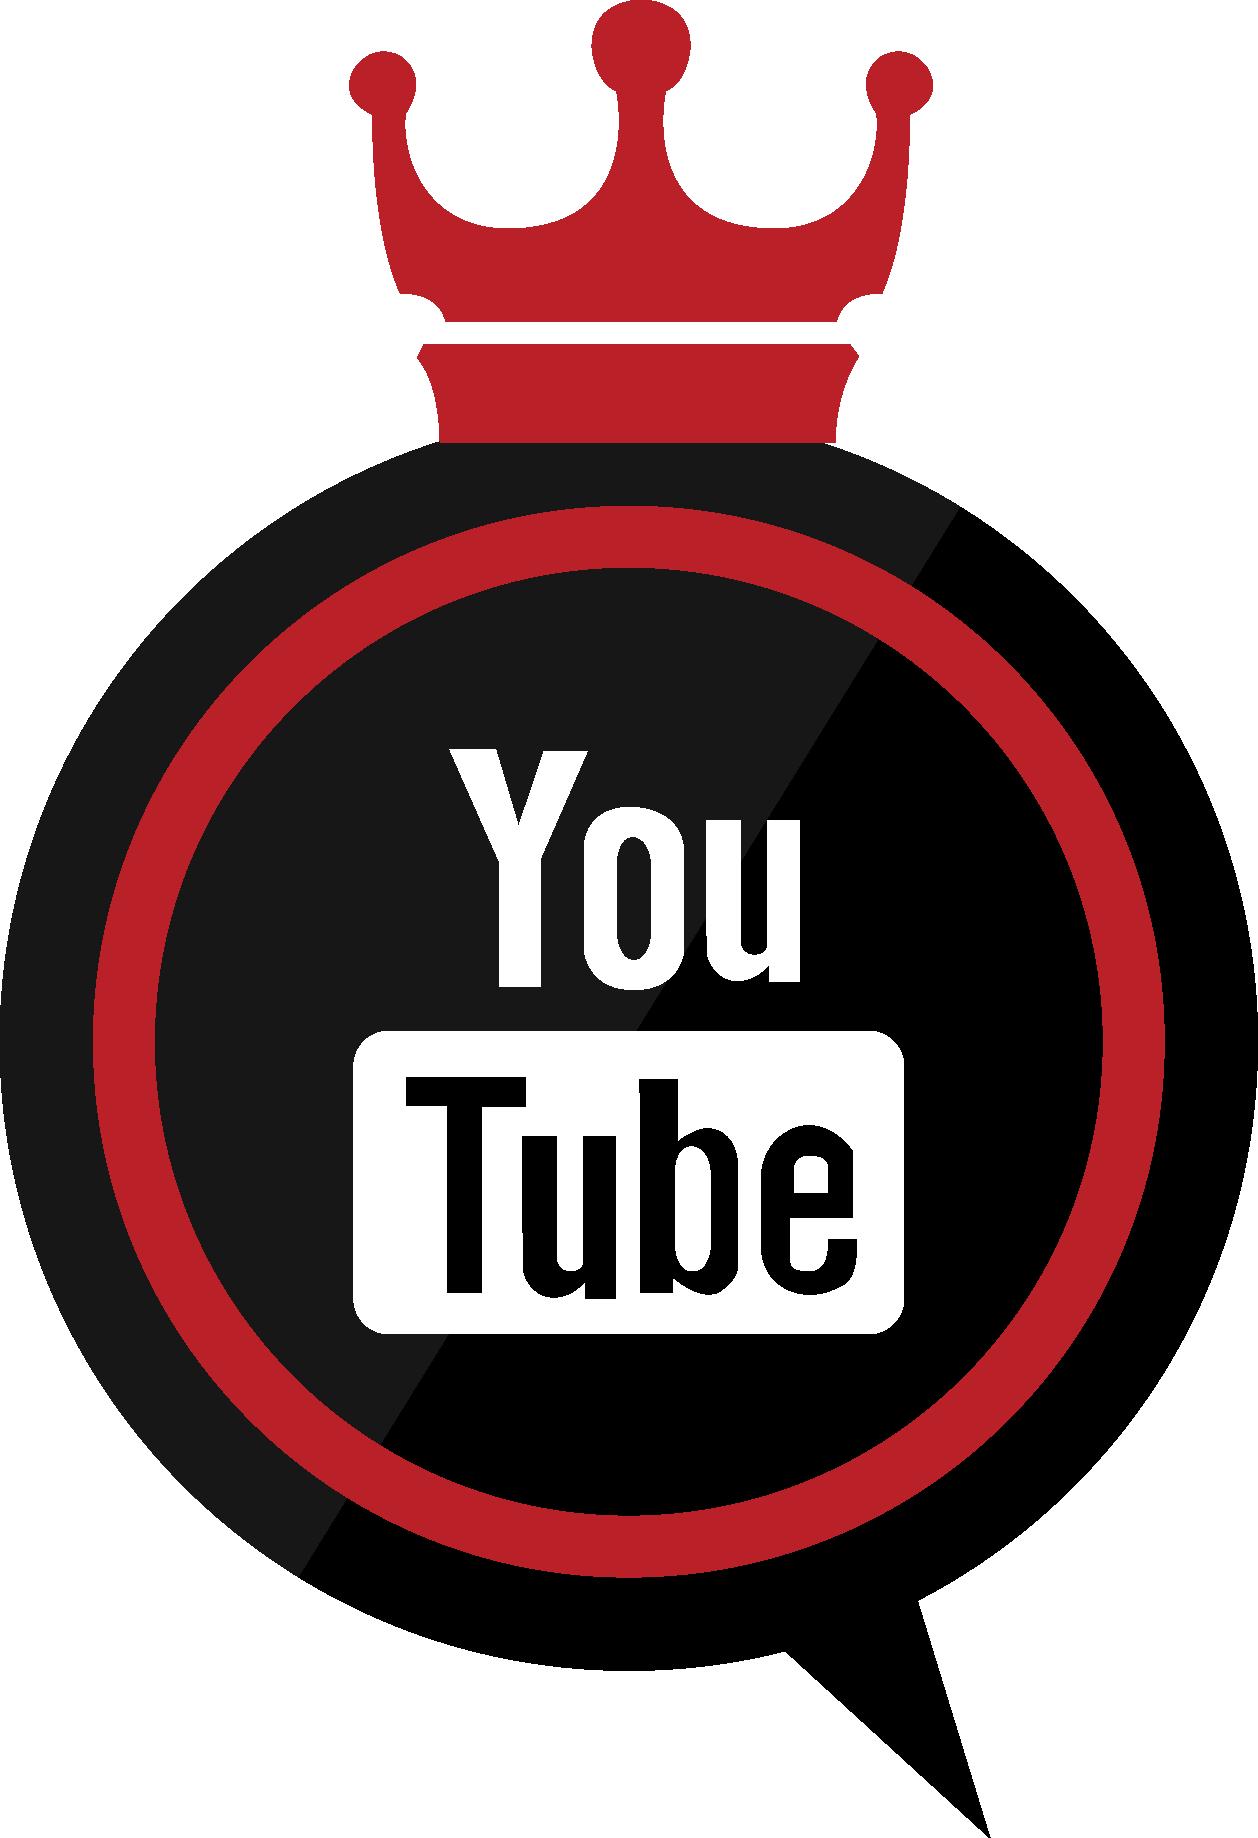 Youtube- Social Media